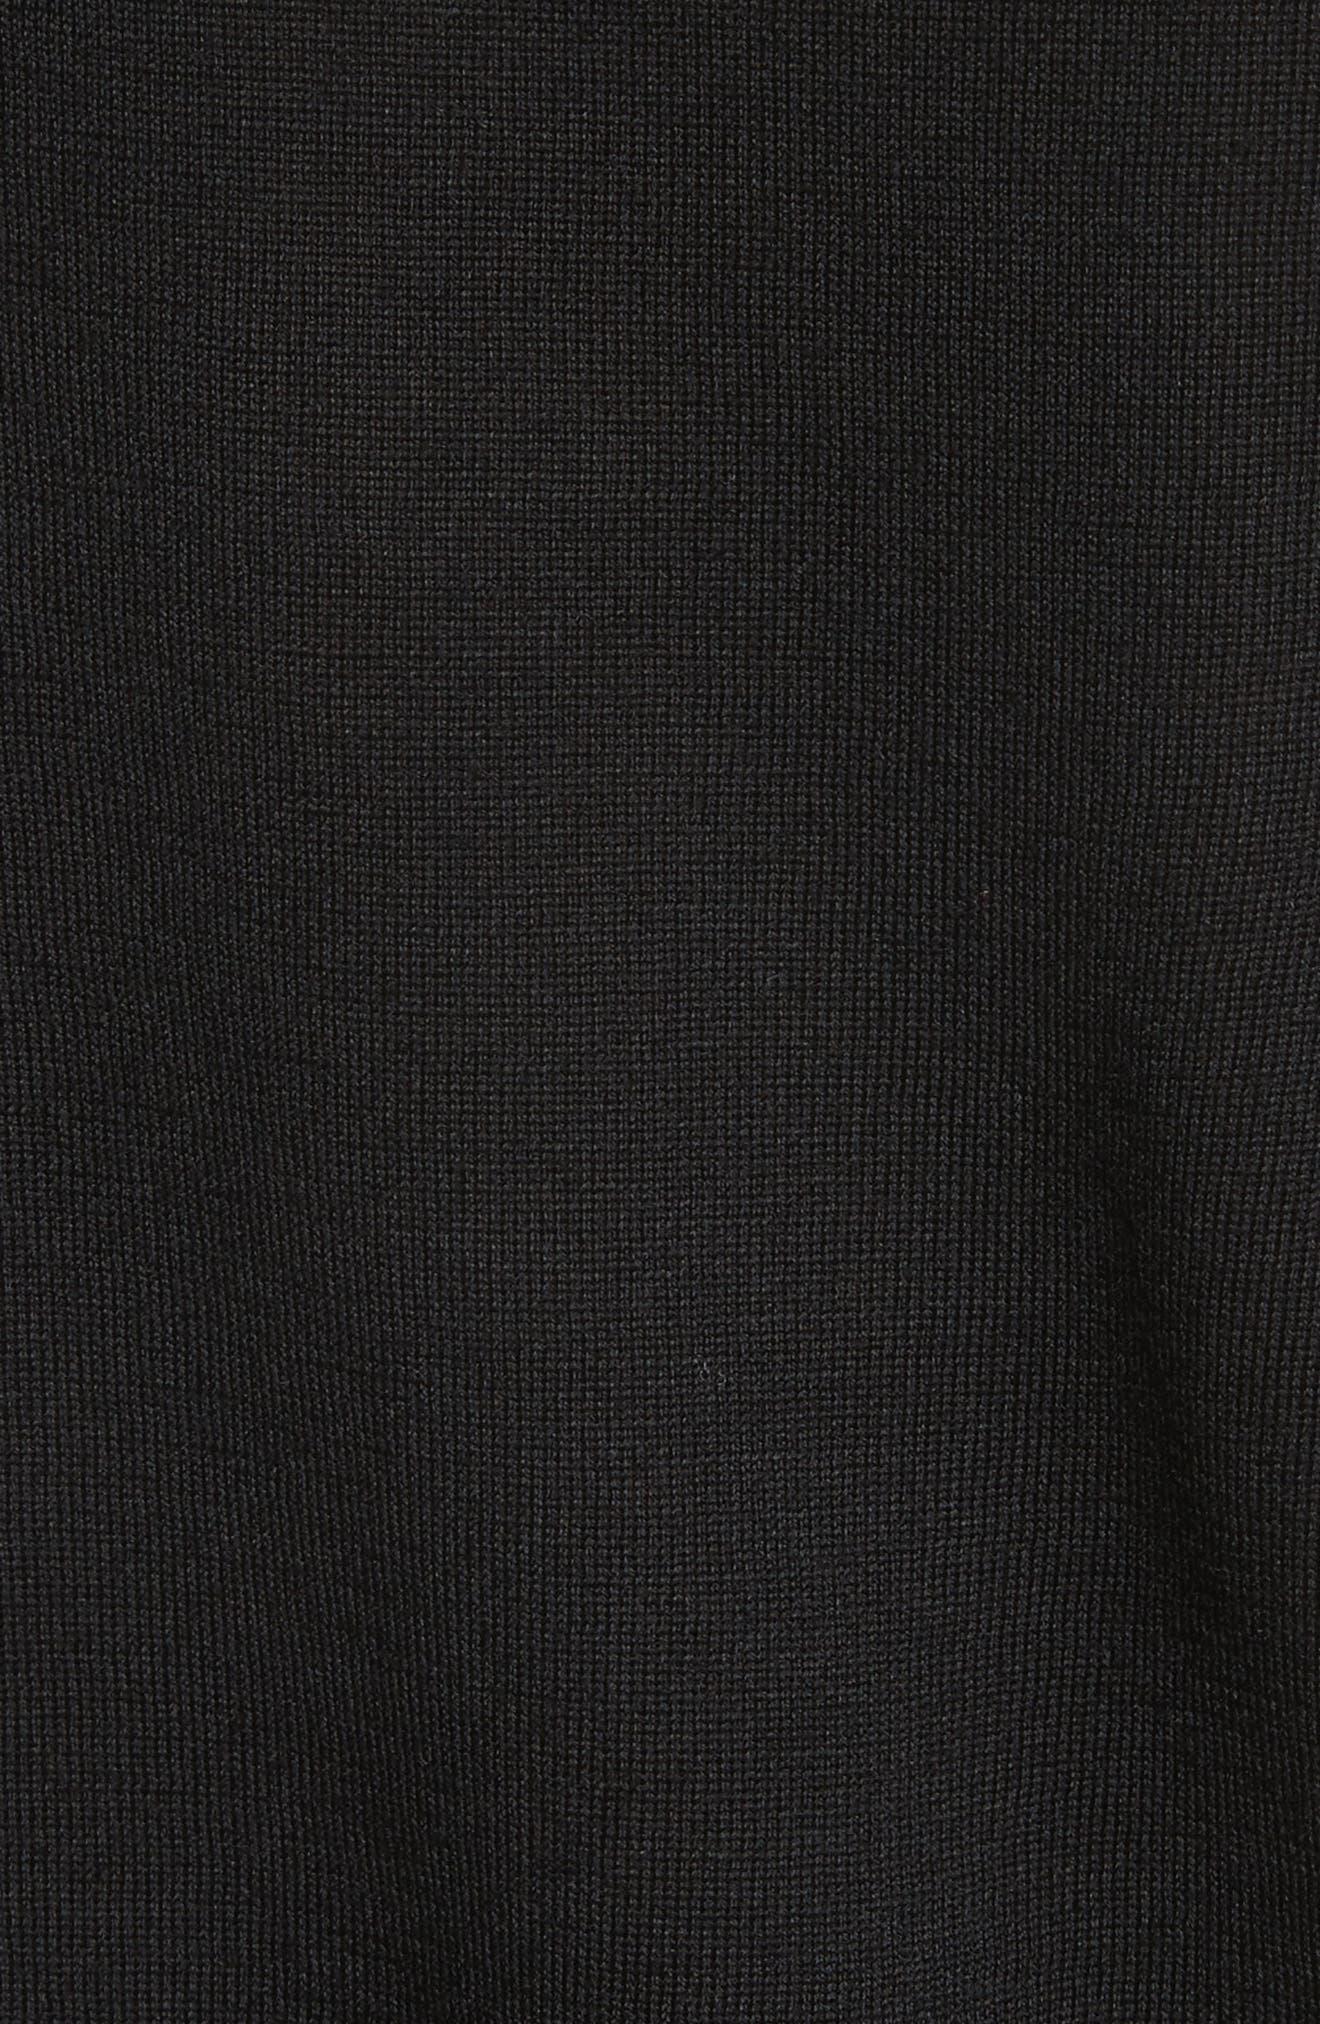 Viar Merino Wool Sweater,                             Alternate thumbnail 5, color,                             001